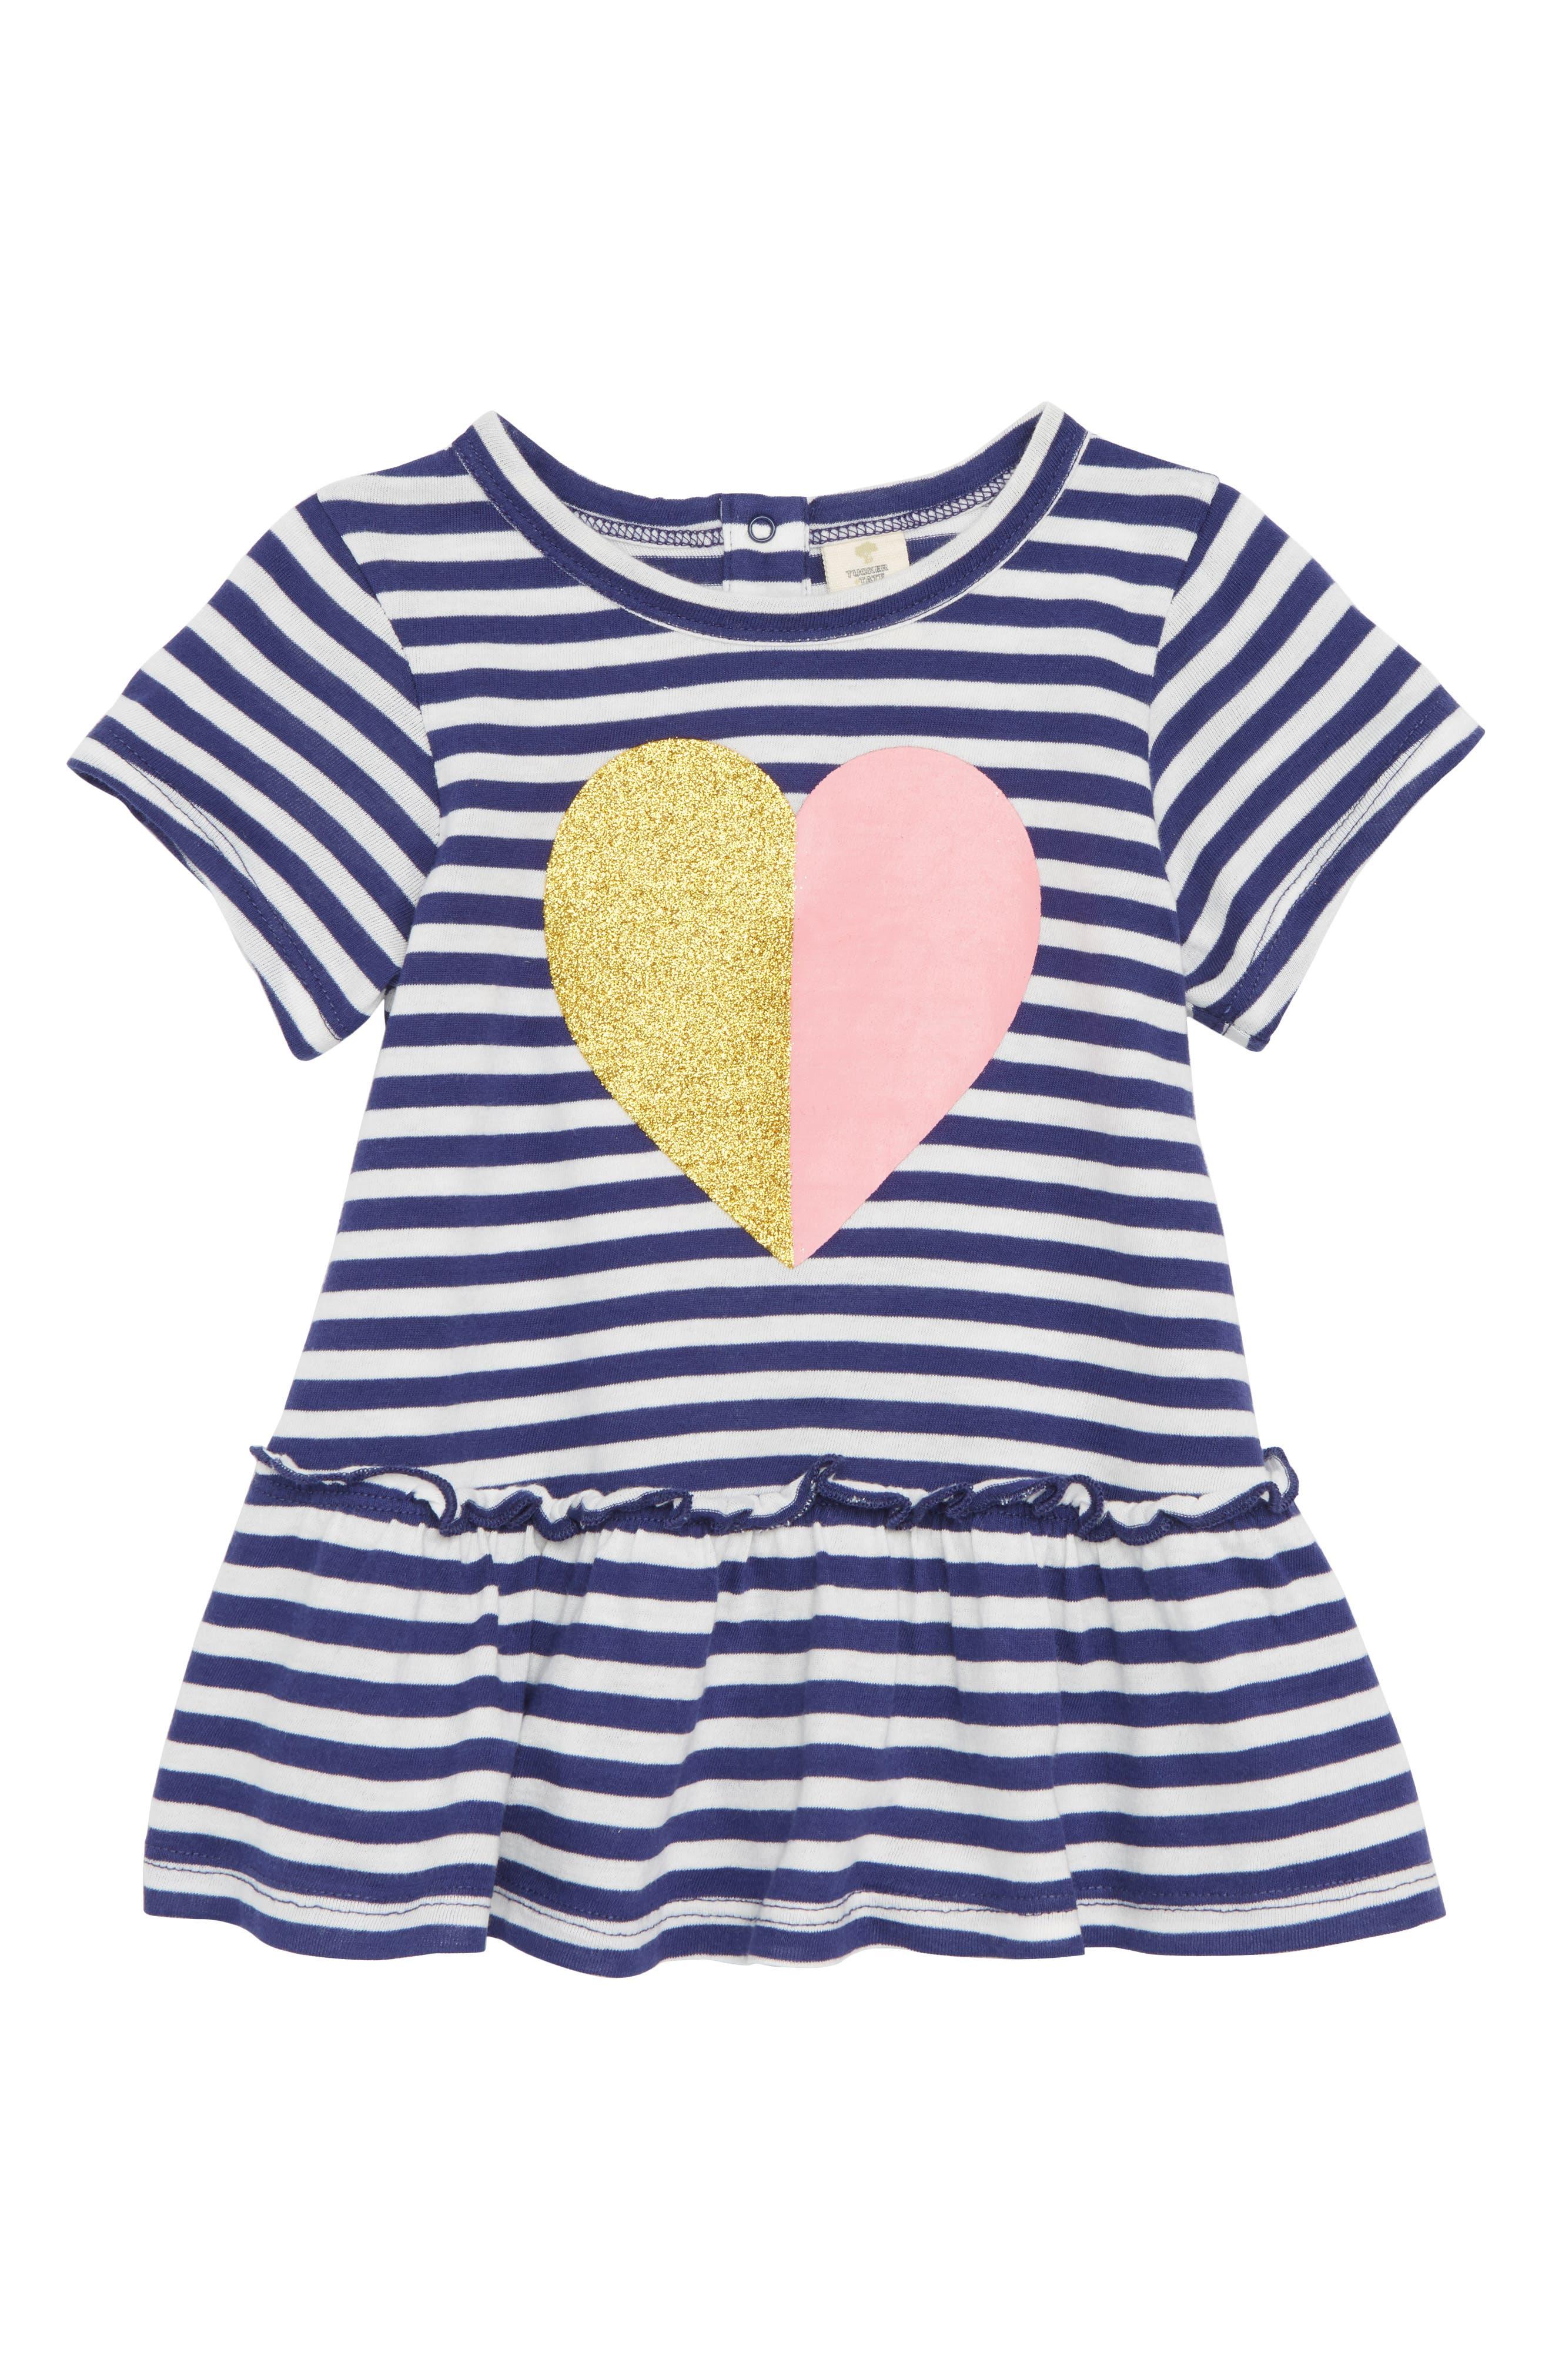 Stripe Peplum Graphic Top,                         Main,                         color, Navy Ribbon Sparkle Heart